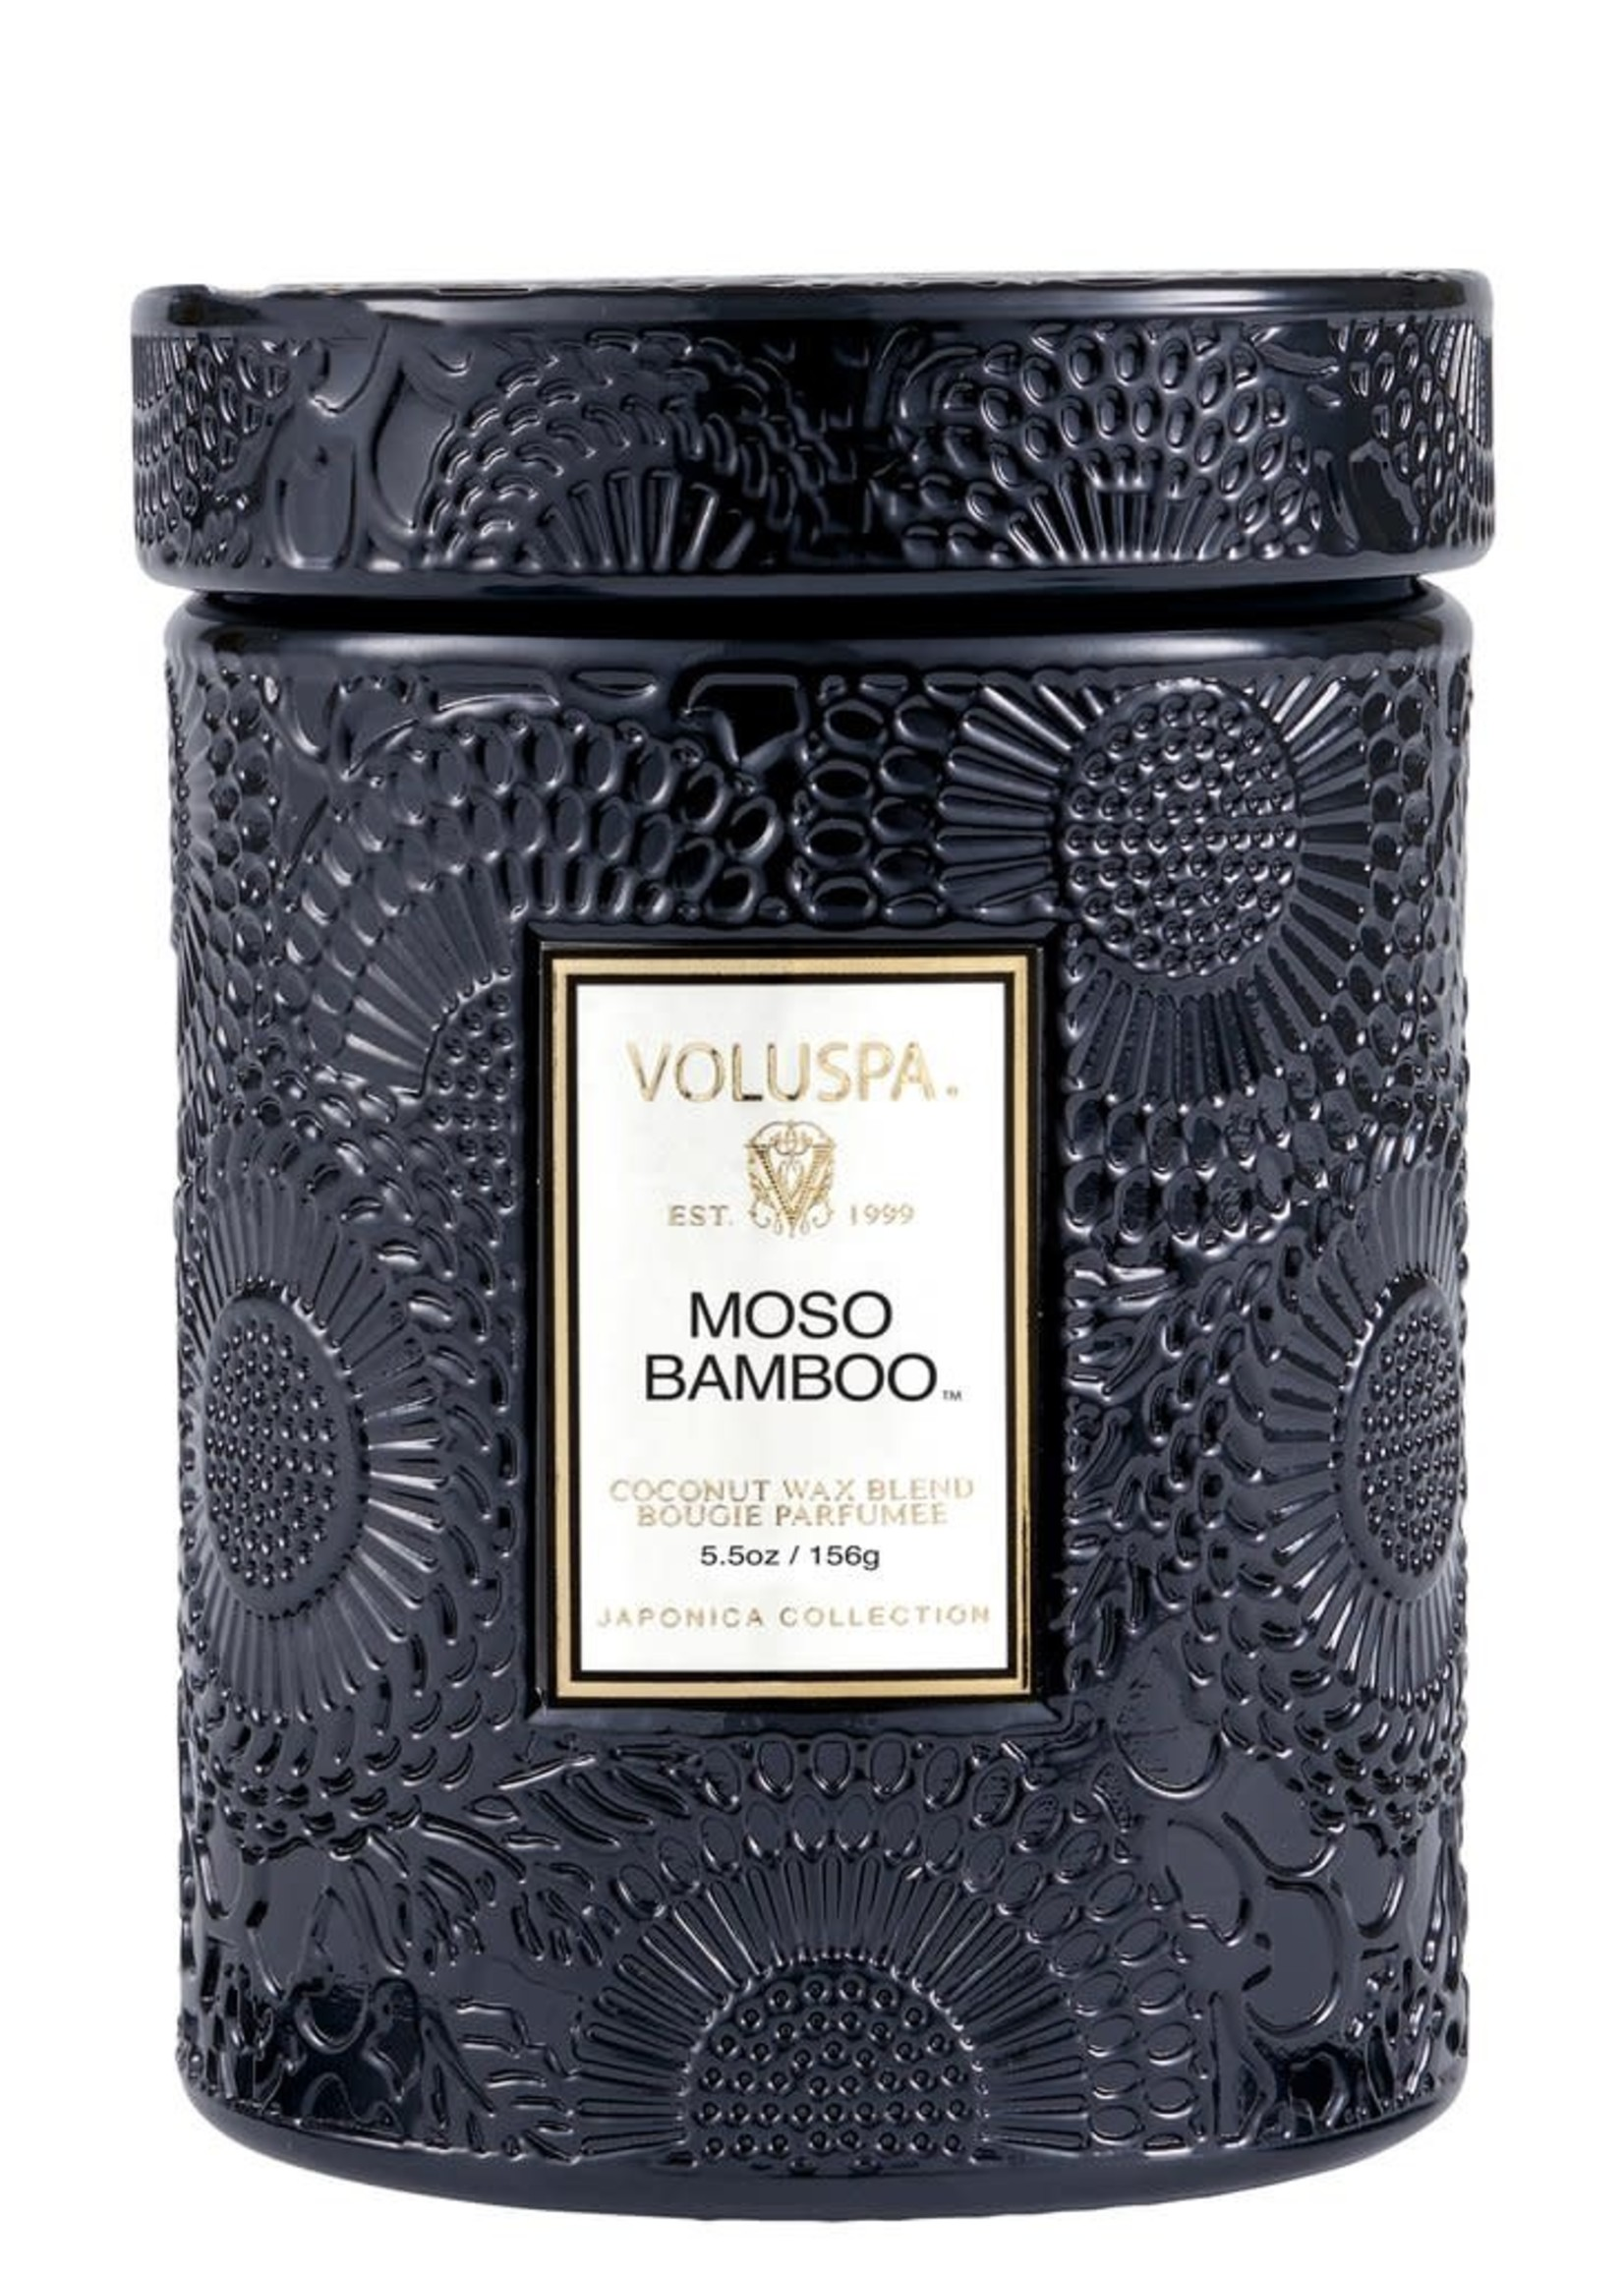 Moso Bamboo 5.5 Oz Mini Embossed Glass Jar Candle W/ Lid